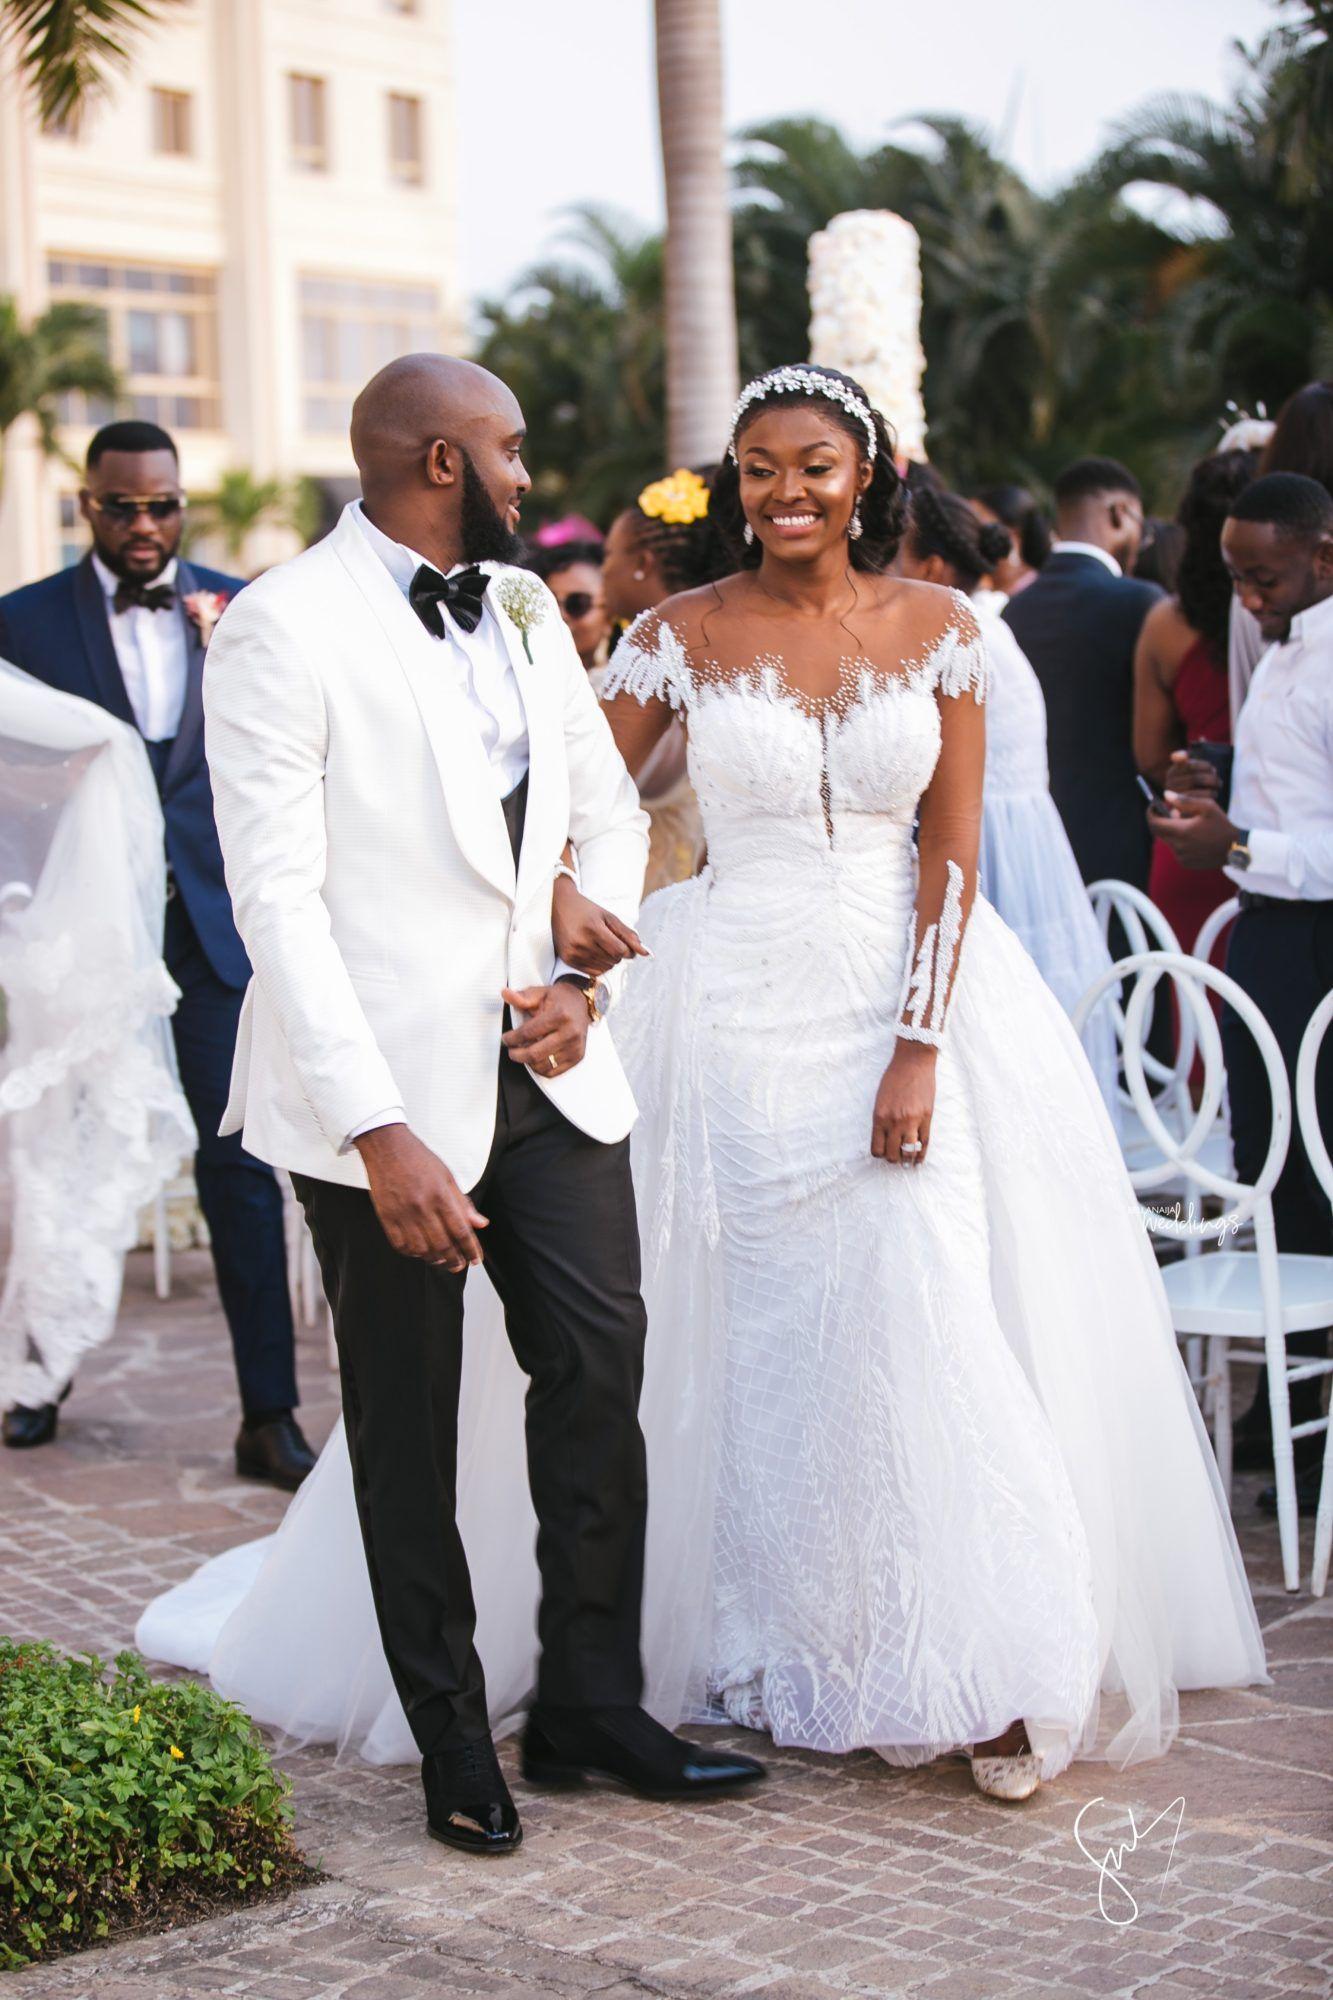 Amanda Sydney S Outdoor White Wedding In Ghana Is Goals In 2020 White Wedding Ceremony White Wedding Online Wedding Dress